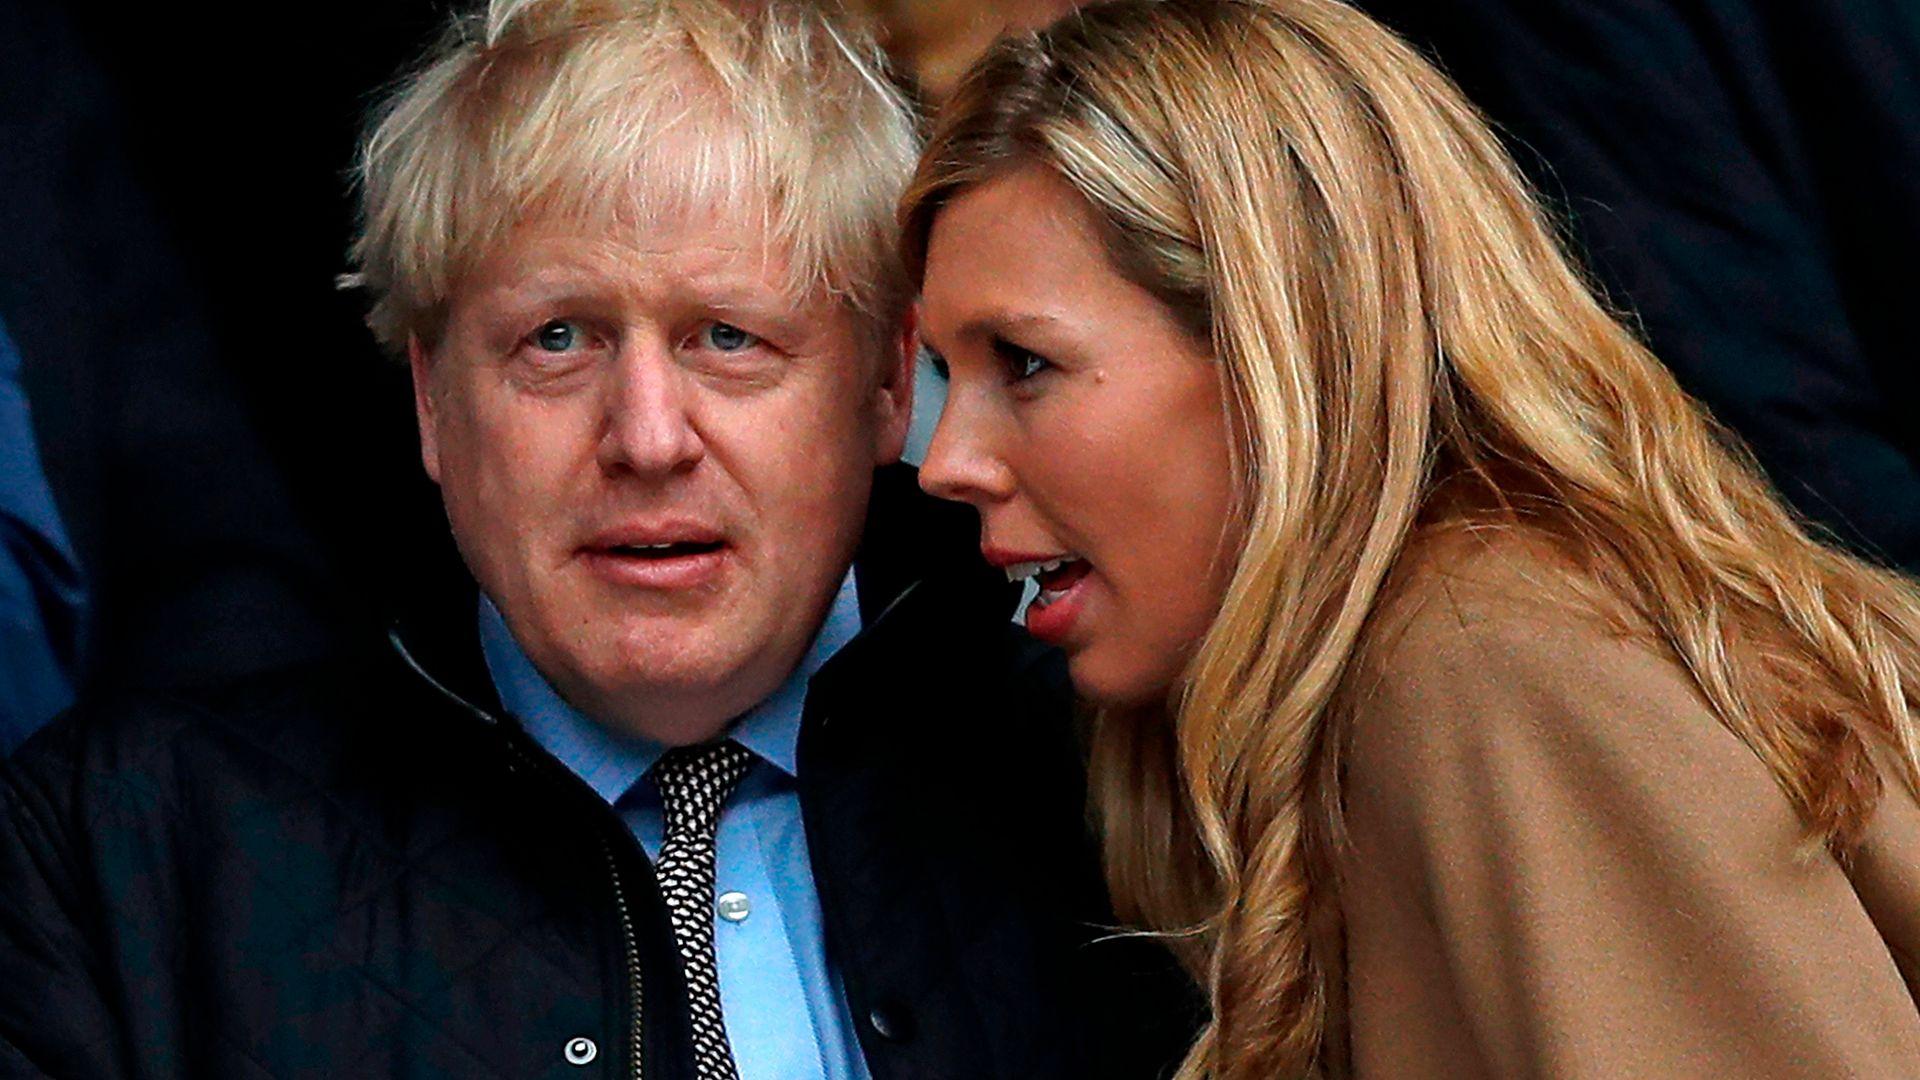 Boris Johnson with his partner Carrie Symonds (R) - Credit: AFP via Getty Images